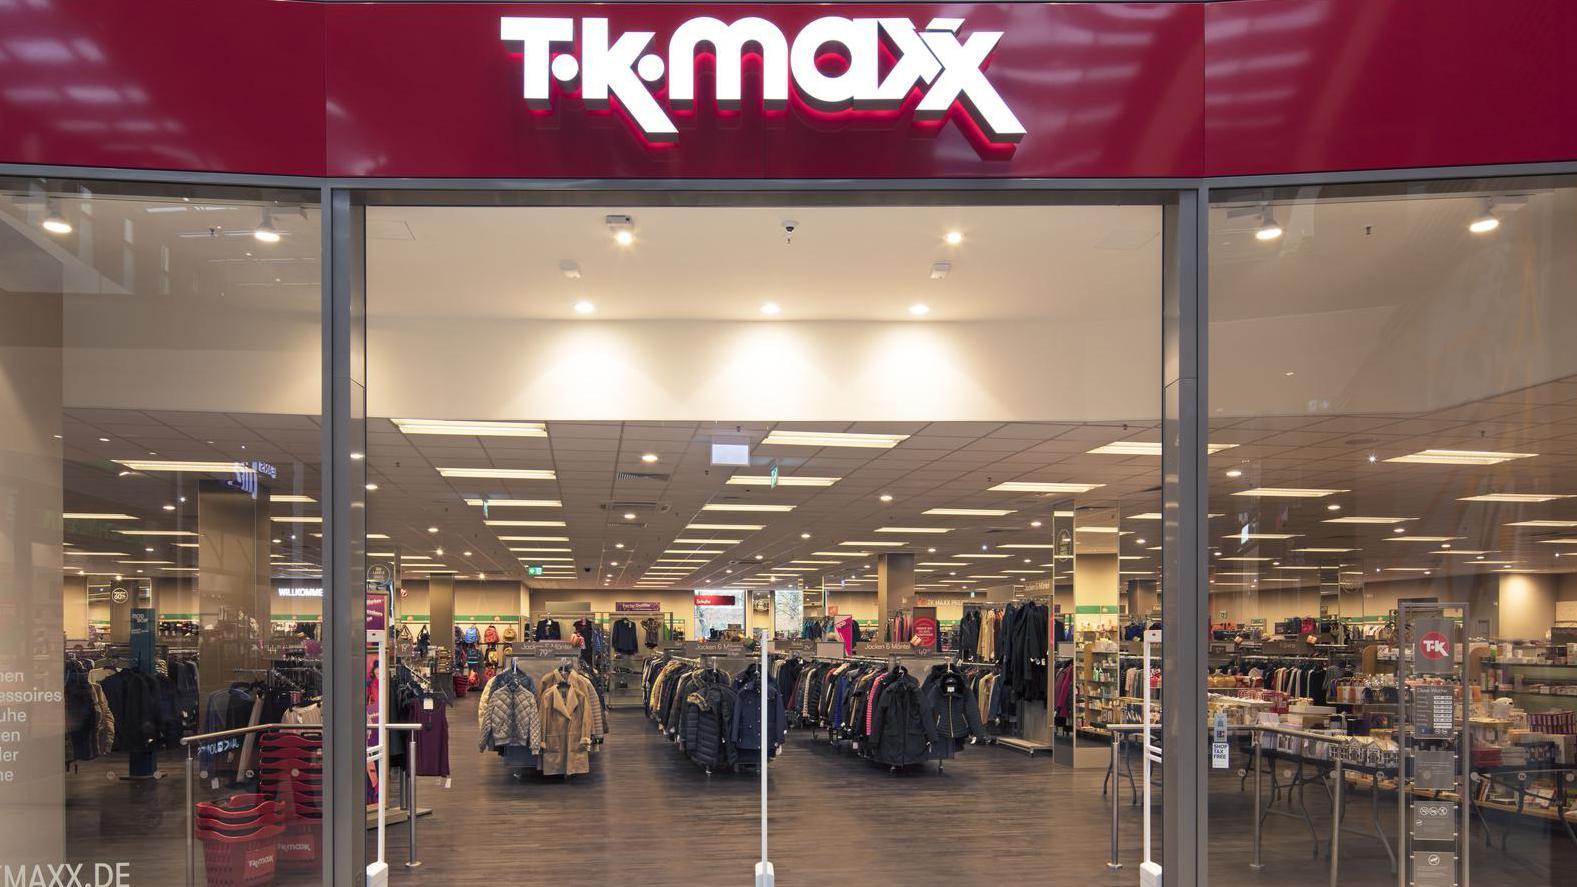 Tk Maxx Cheap Designer Clothes | Tk Maxx Emsgalerie Rheine